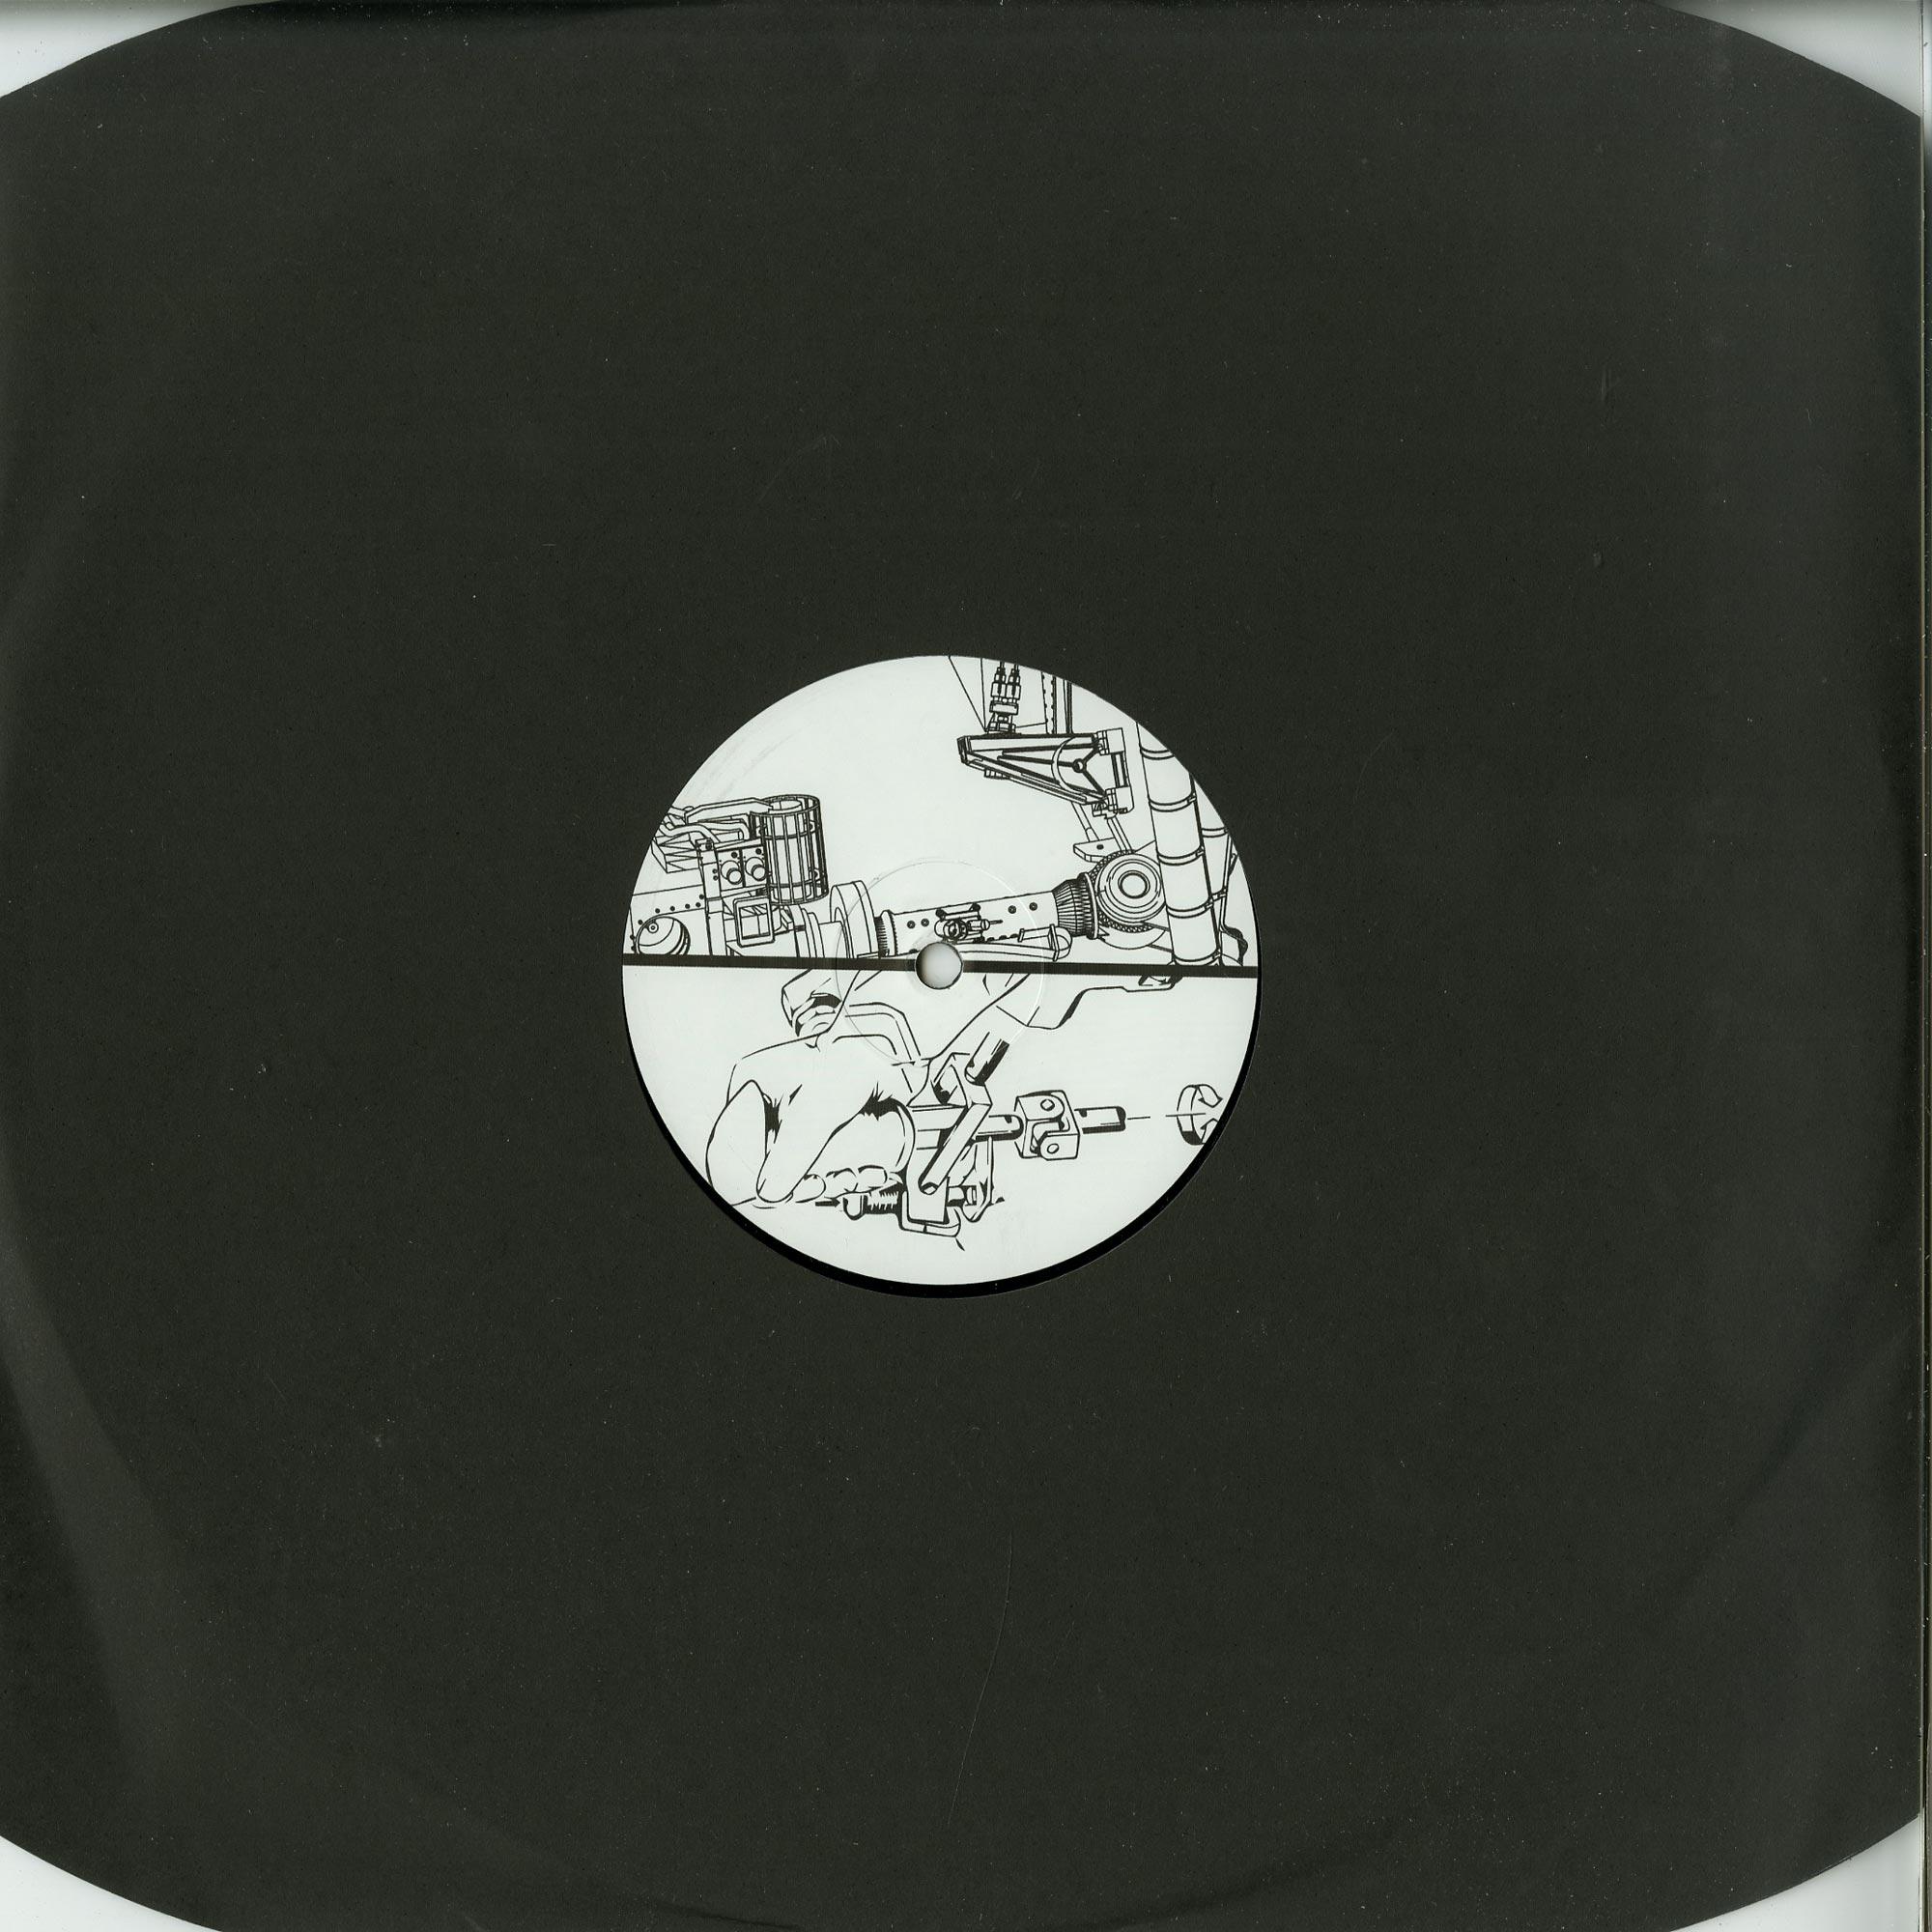 Costa Harko, Spangleman - SPLITOOLS 003